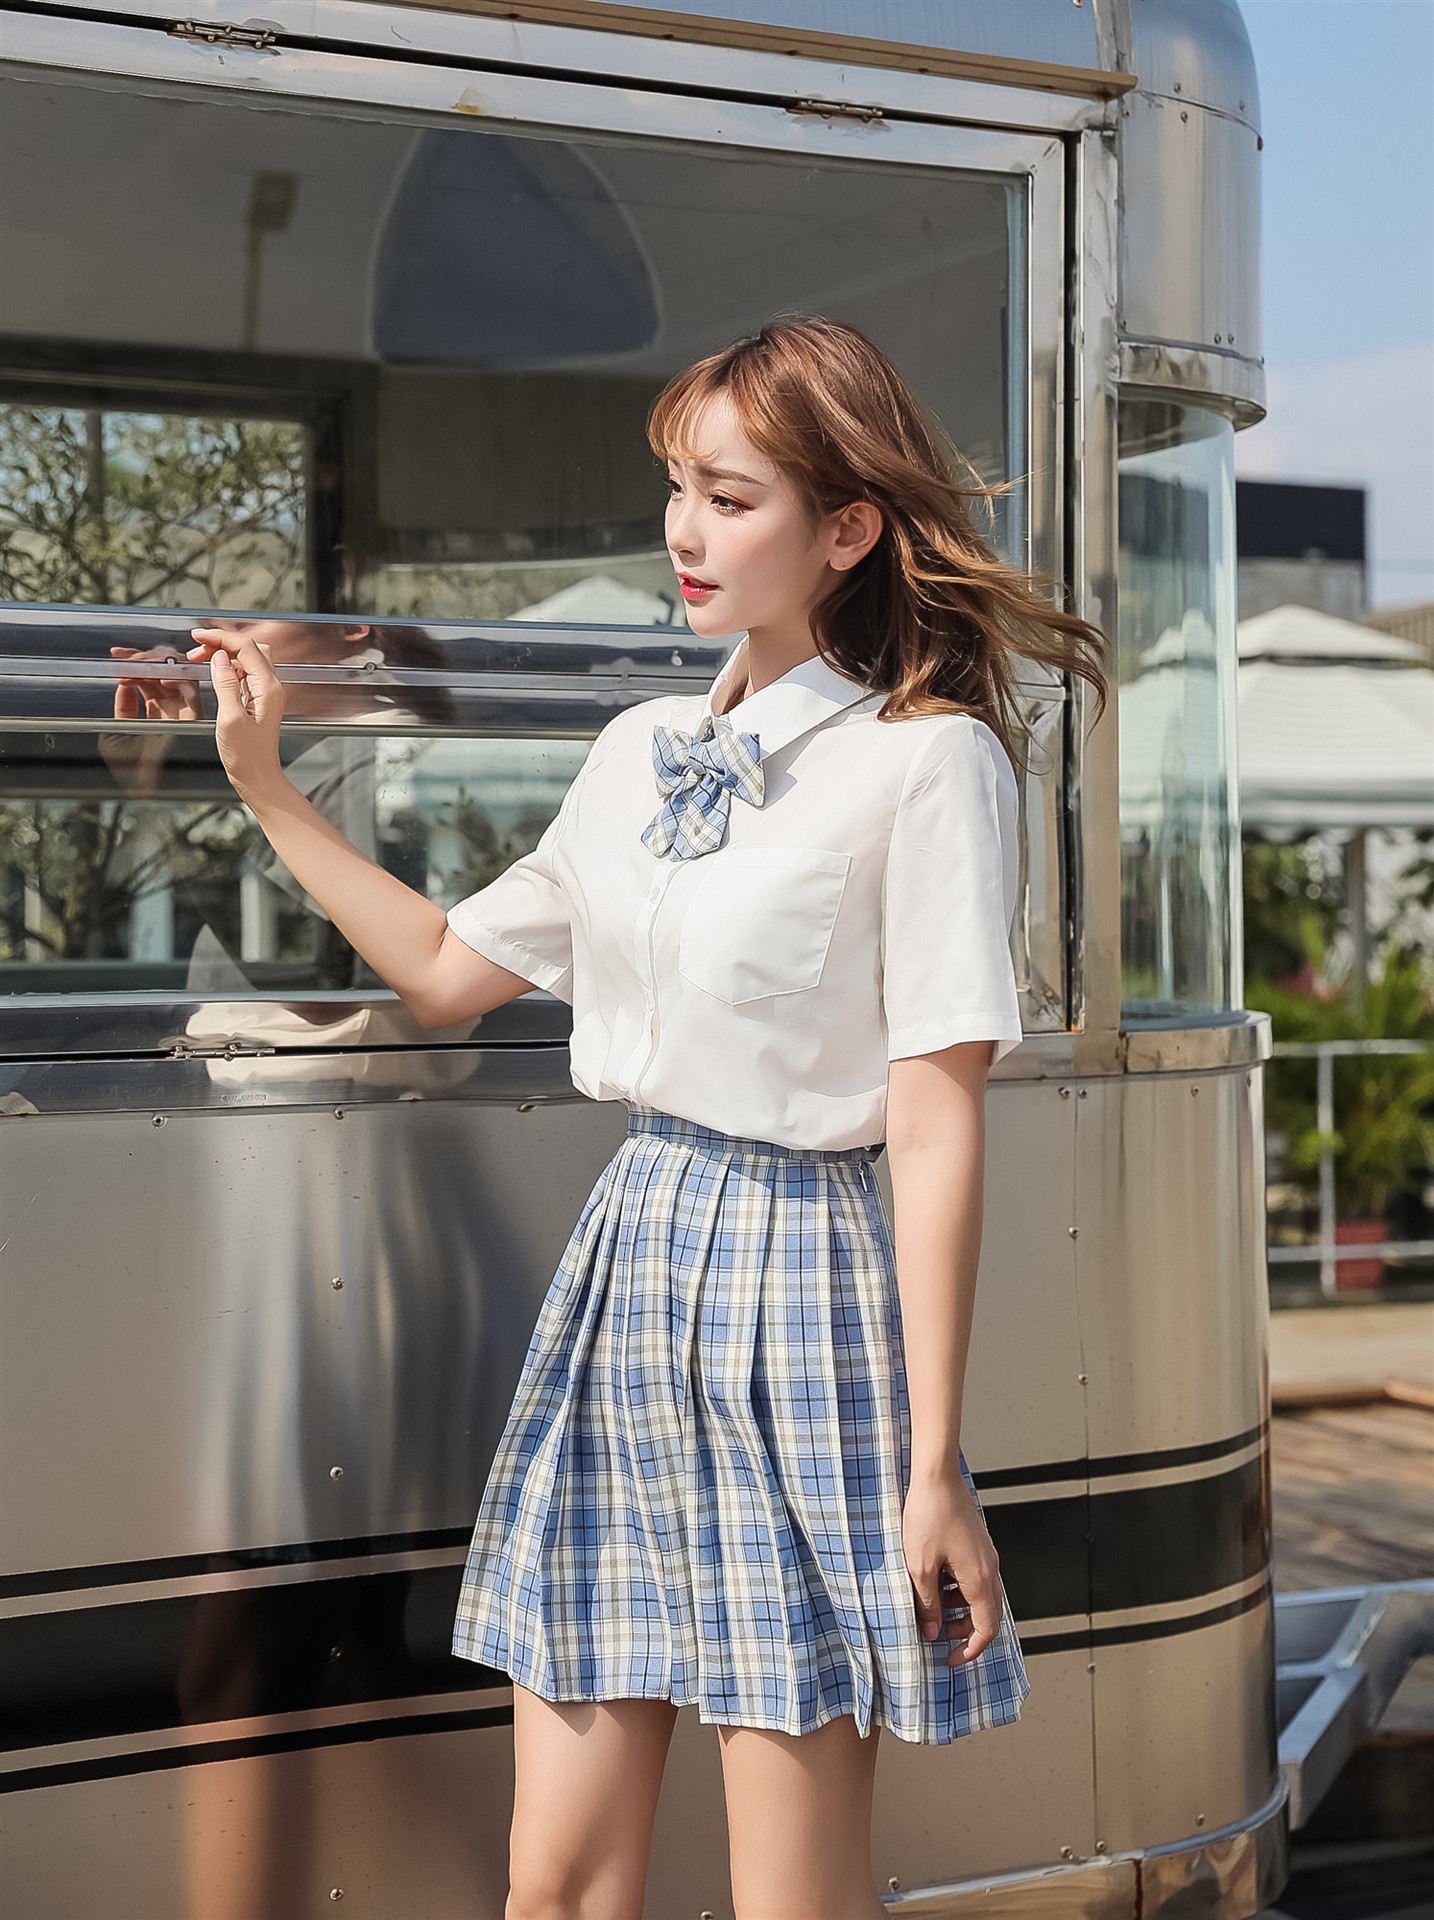 New Japanese Female JK Uniform Summer School Uniform Suit High School Graduation Clothes Plaid College Skirt